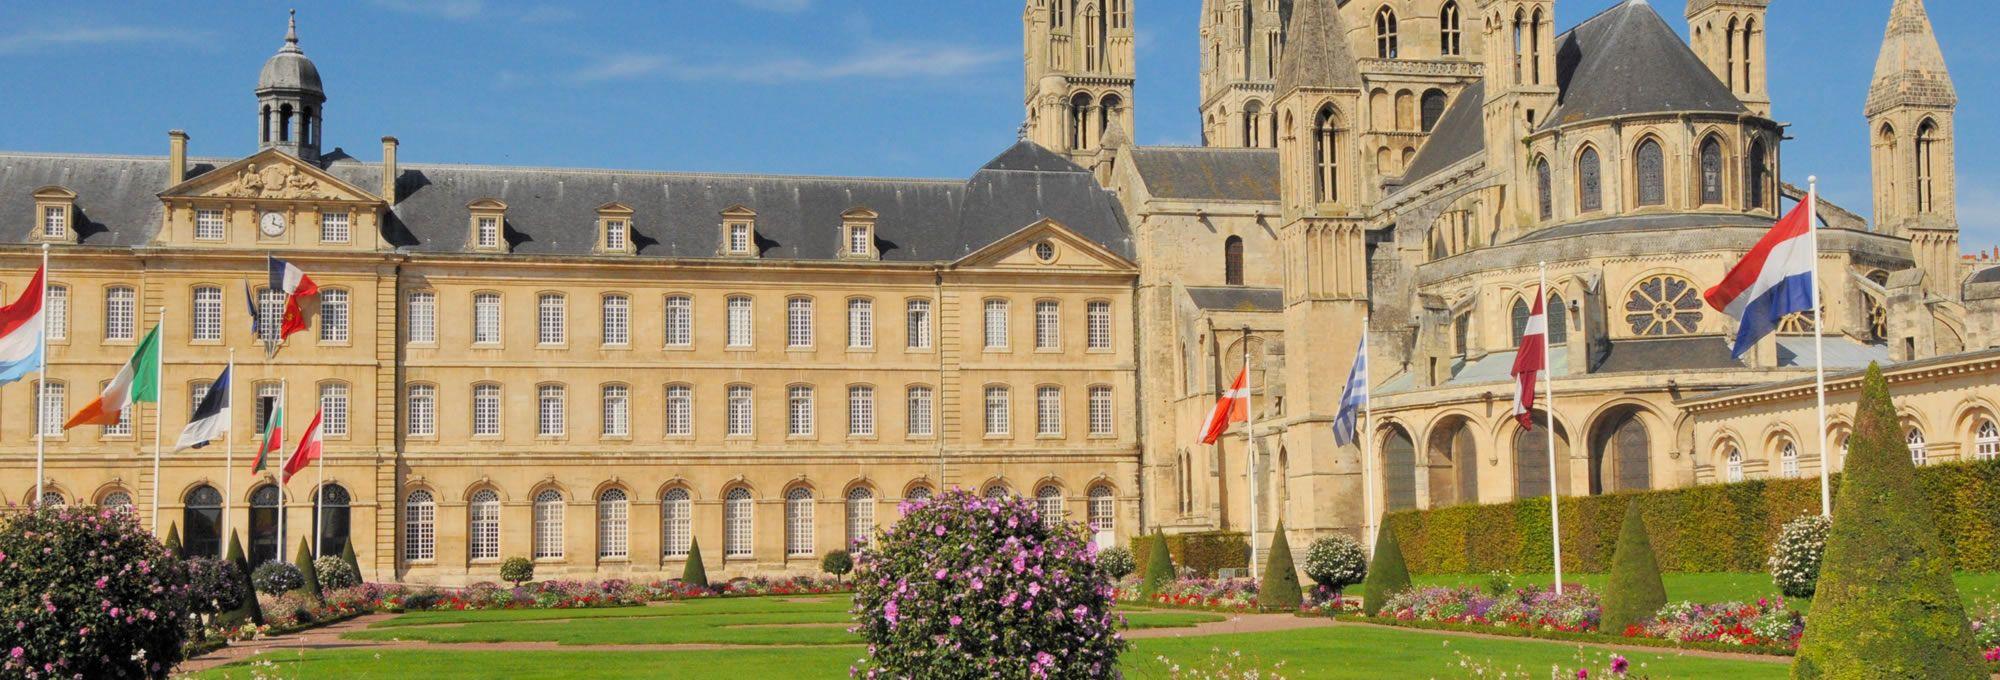 Que visiter à Caen ?